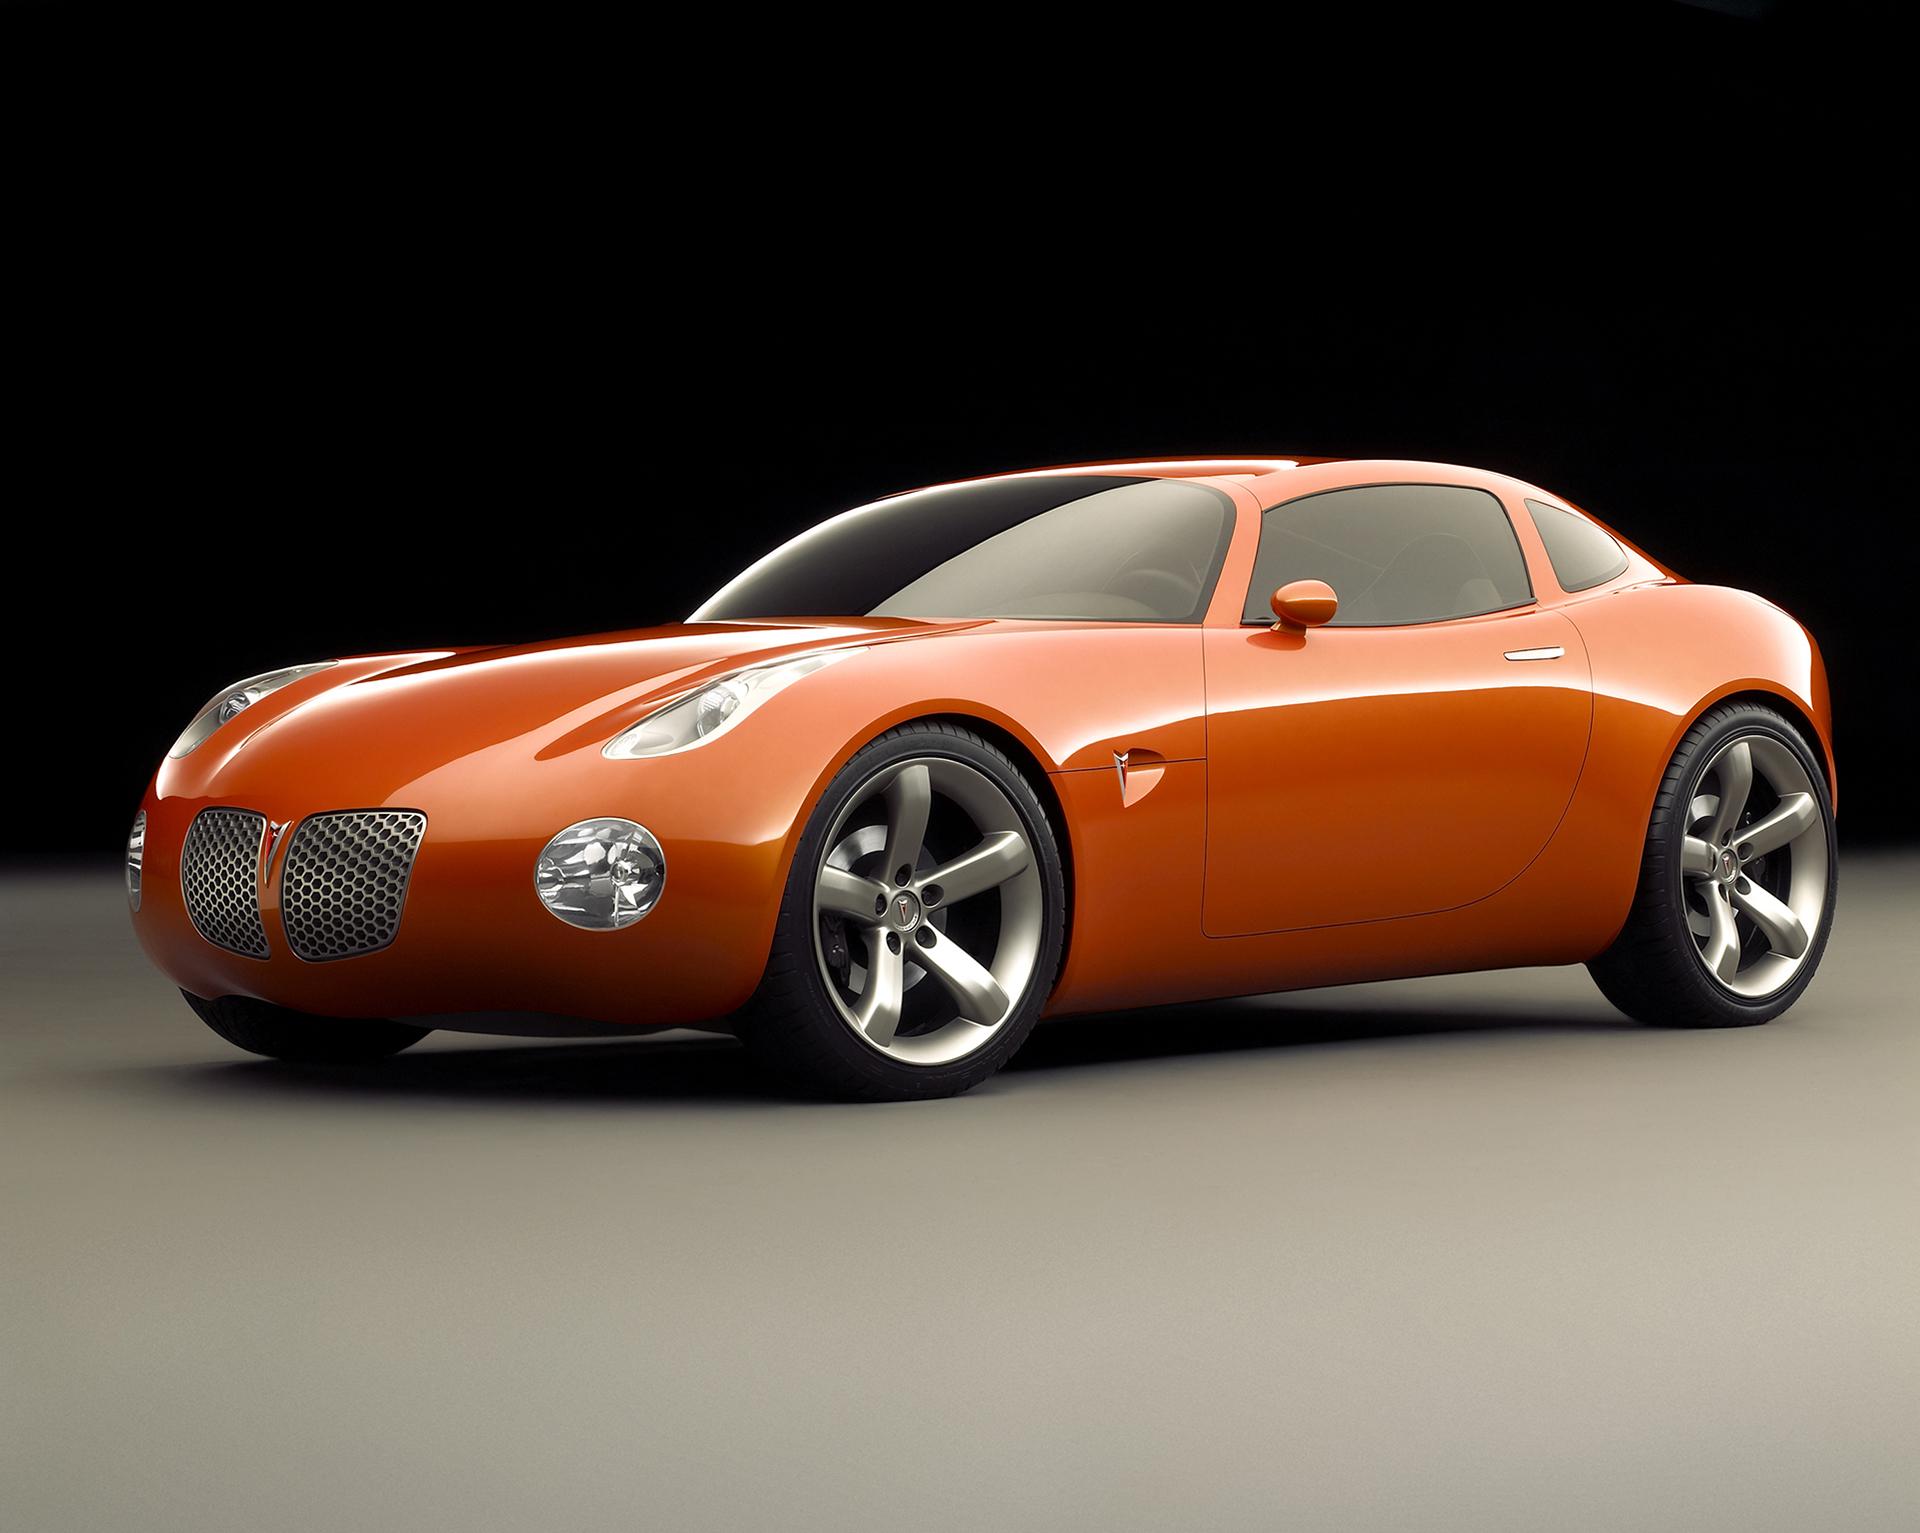 2002 pontiac solstice coupe concept front three-quarter